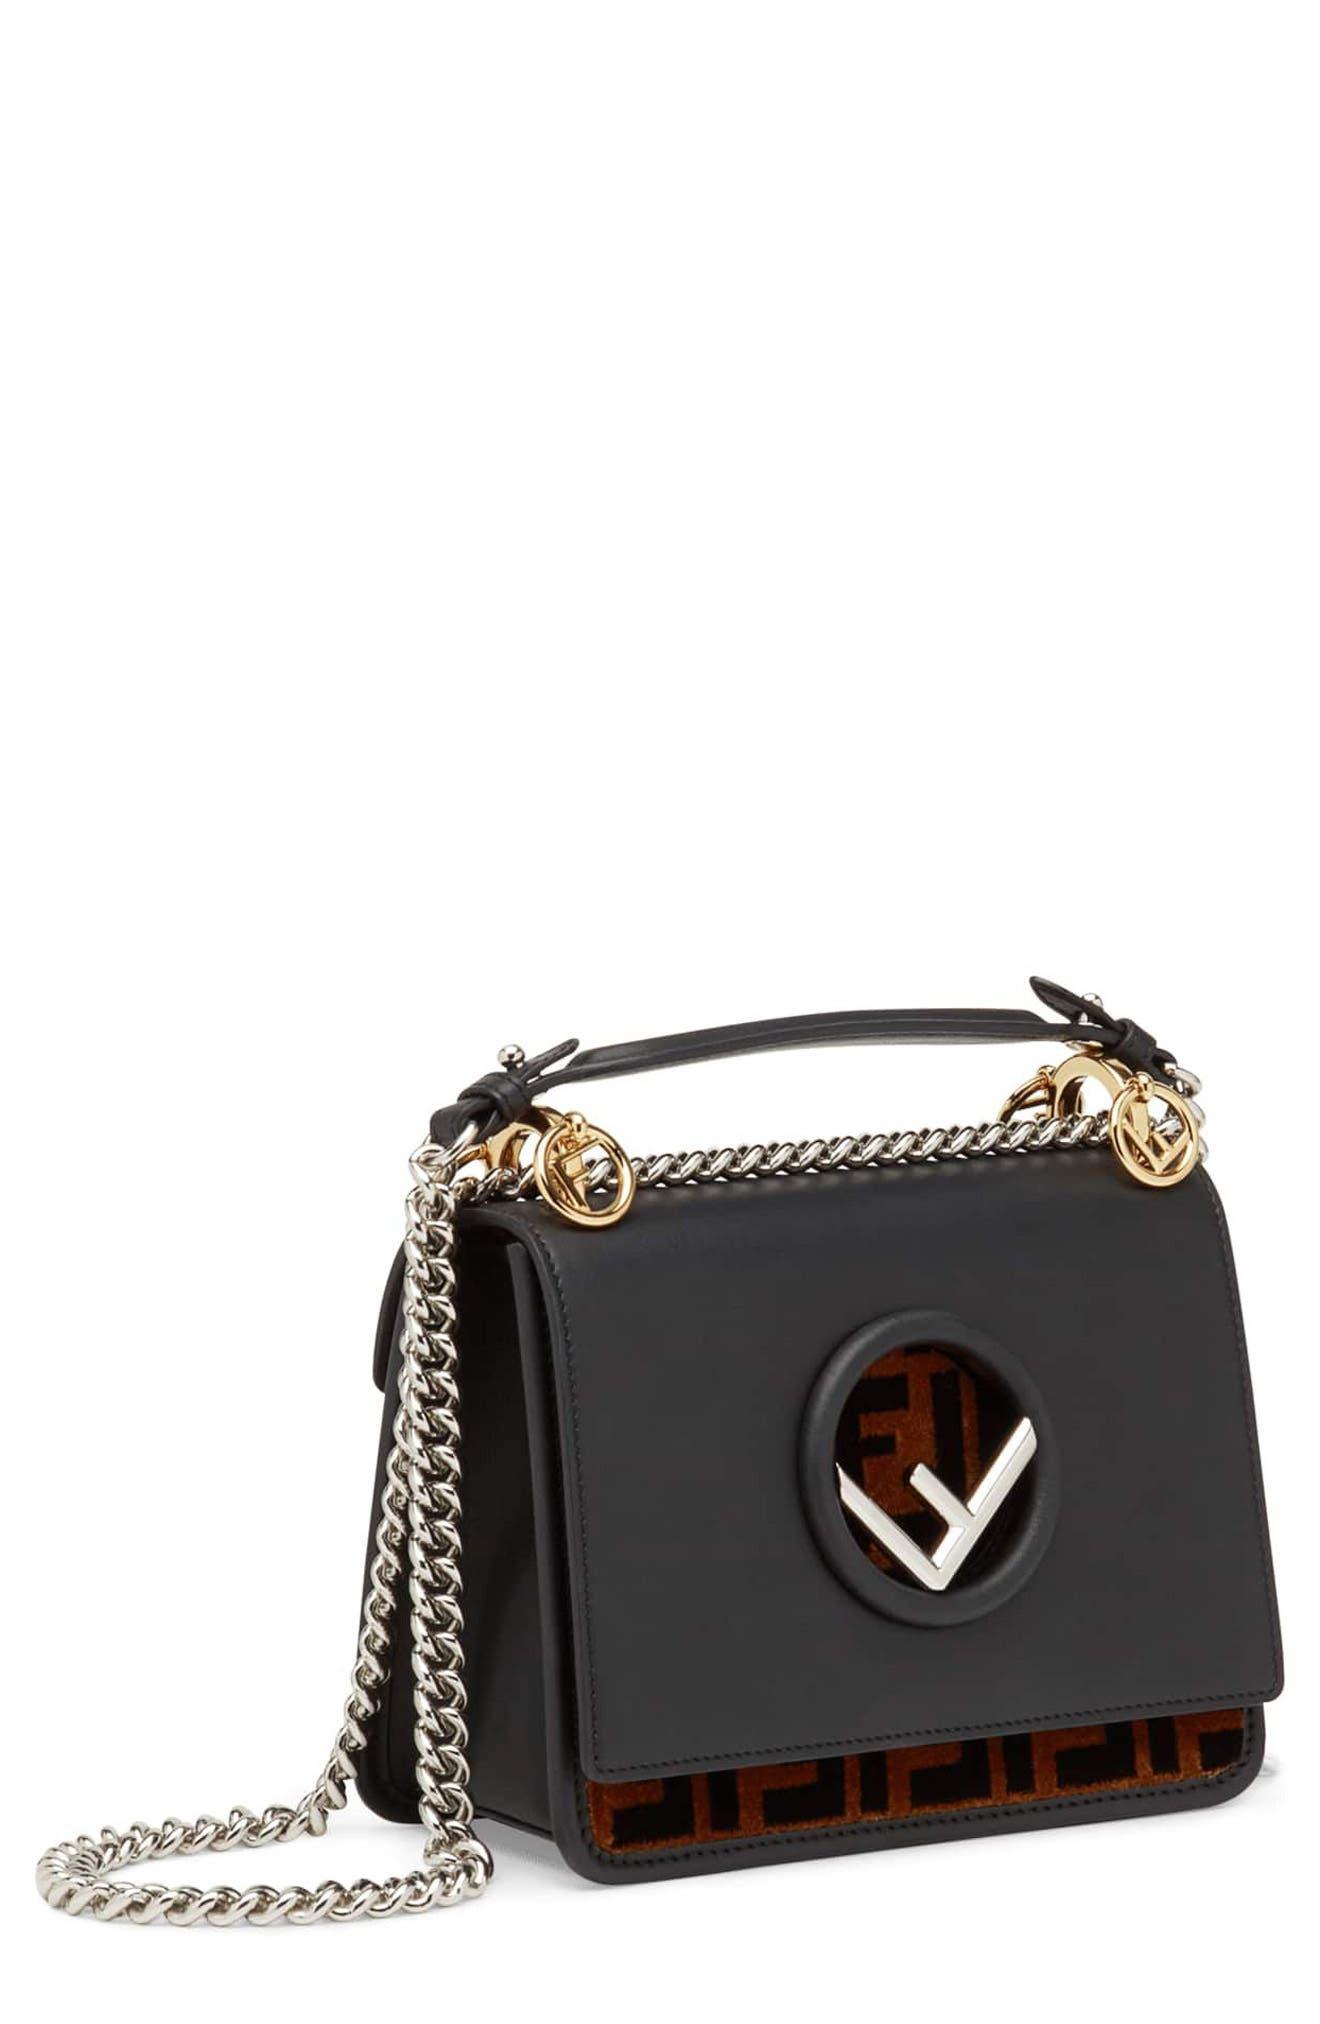 Small Kan I Logo Leather Shoulder Bag,                         Main,                         color, NERO/ TOBACCO/ PALLADIO